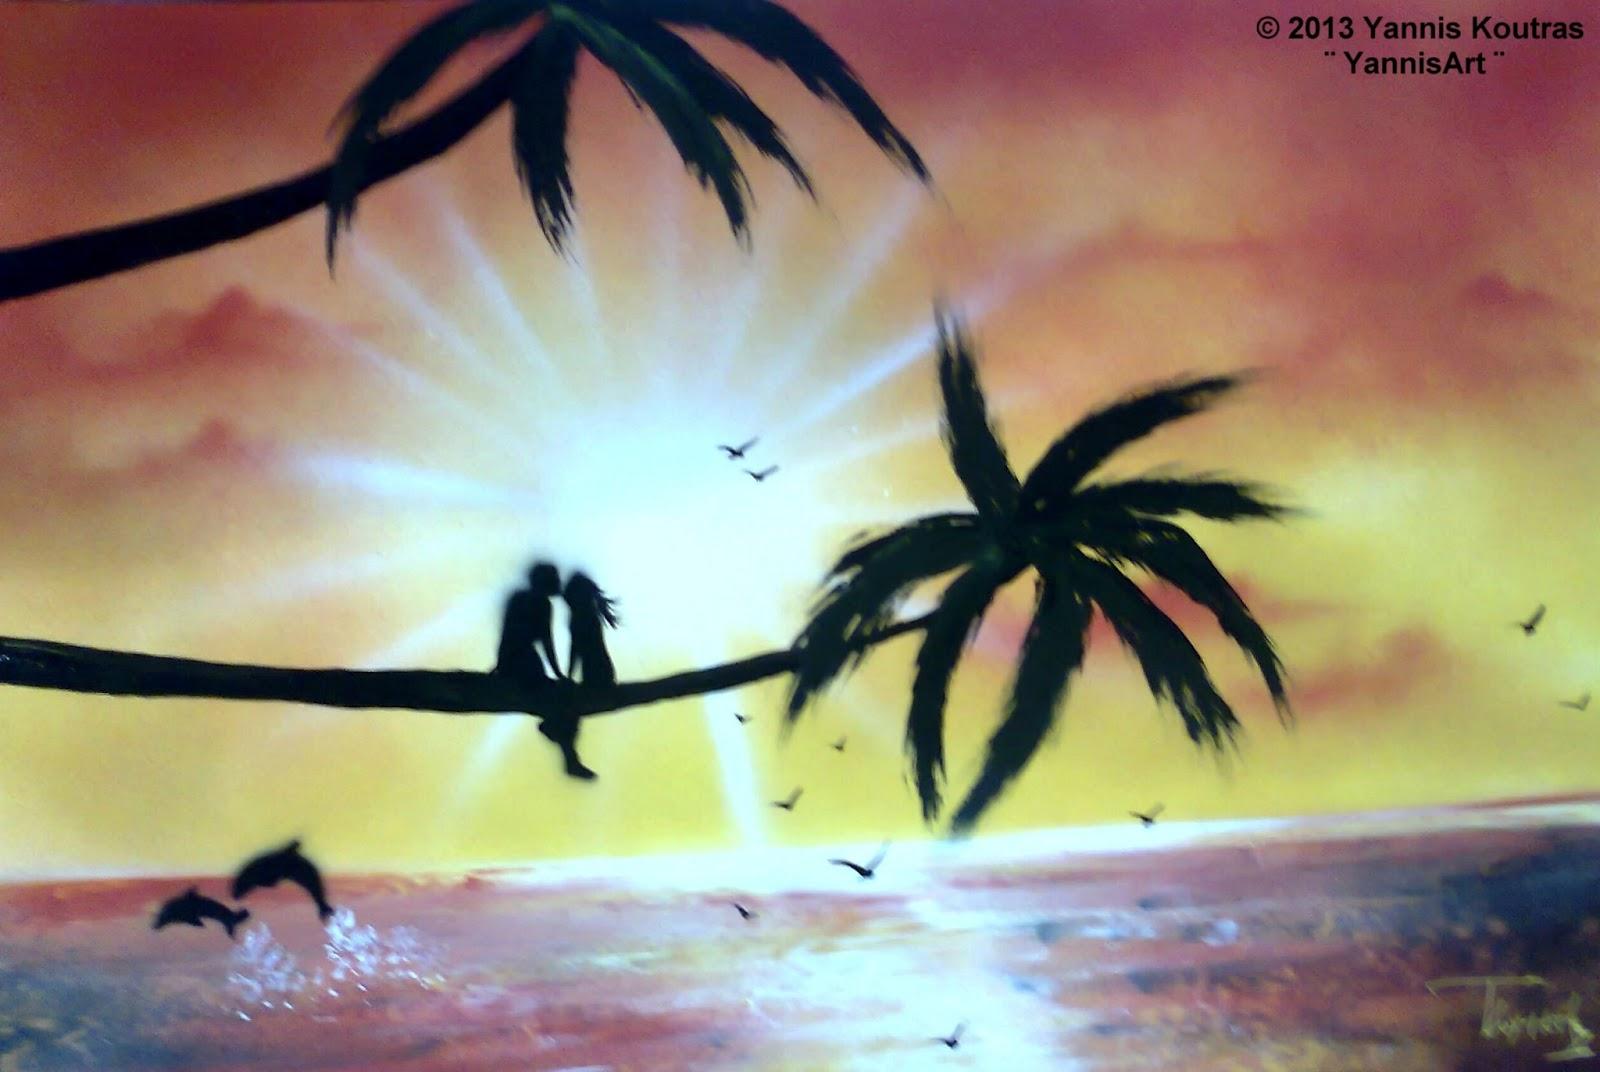 space art spray paint art by yannisart yannis koutras